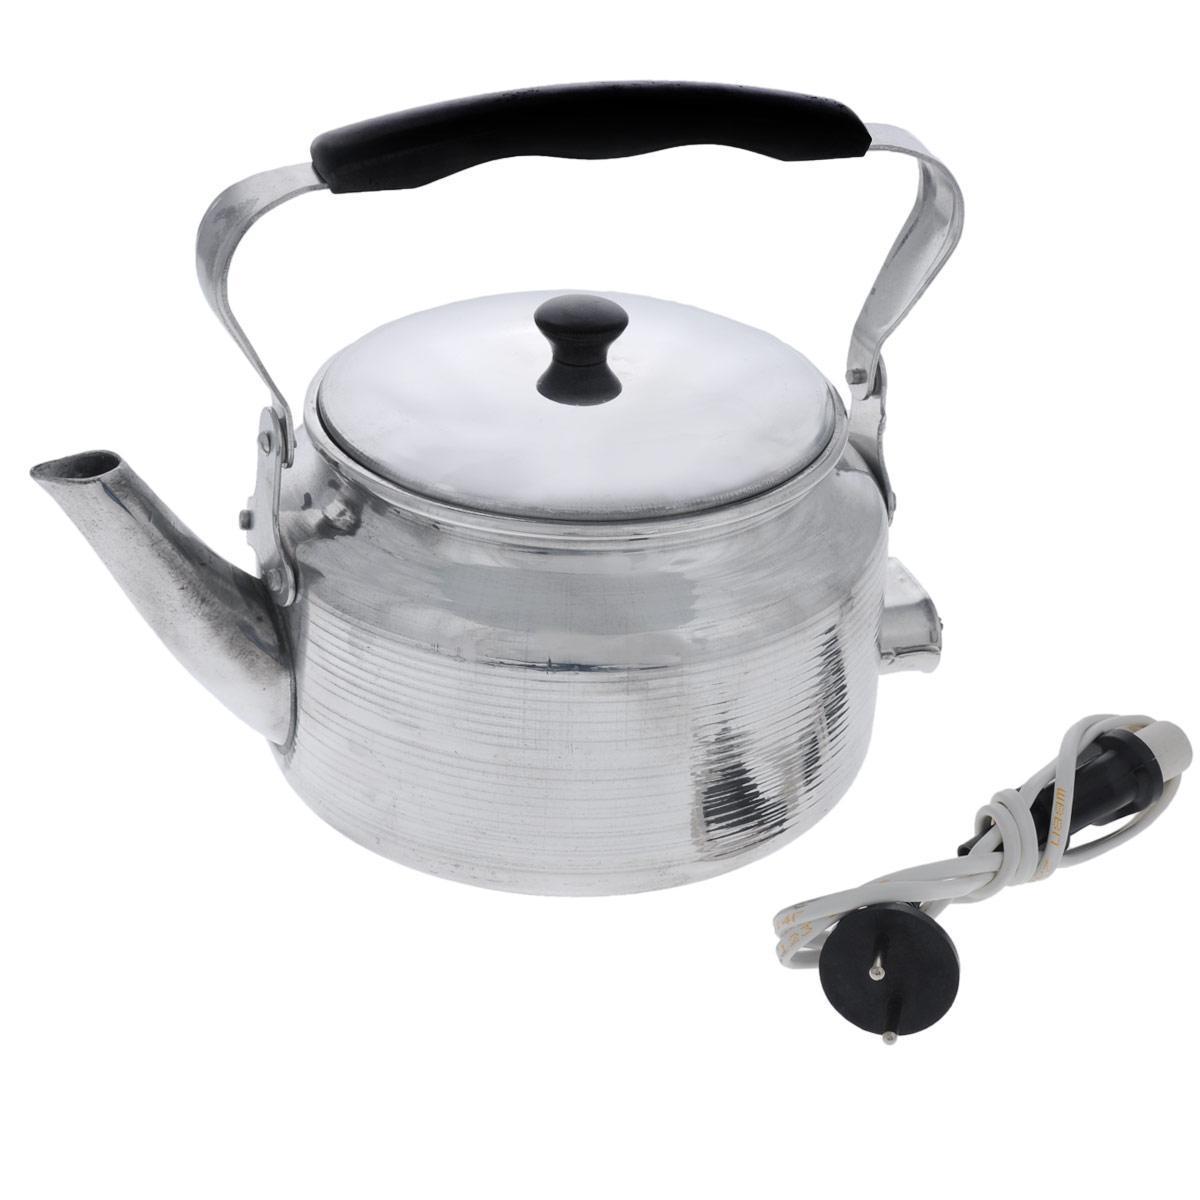 Эрг-AL Москва (ЭЧ-2) электрический чайник